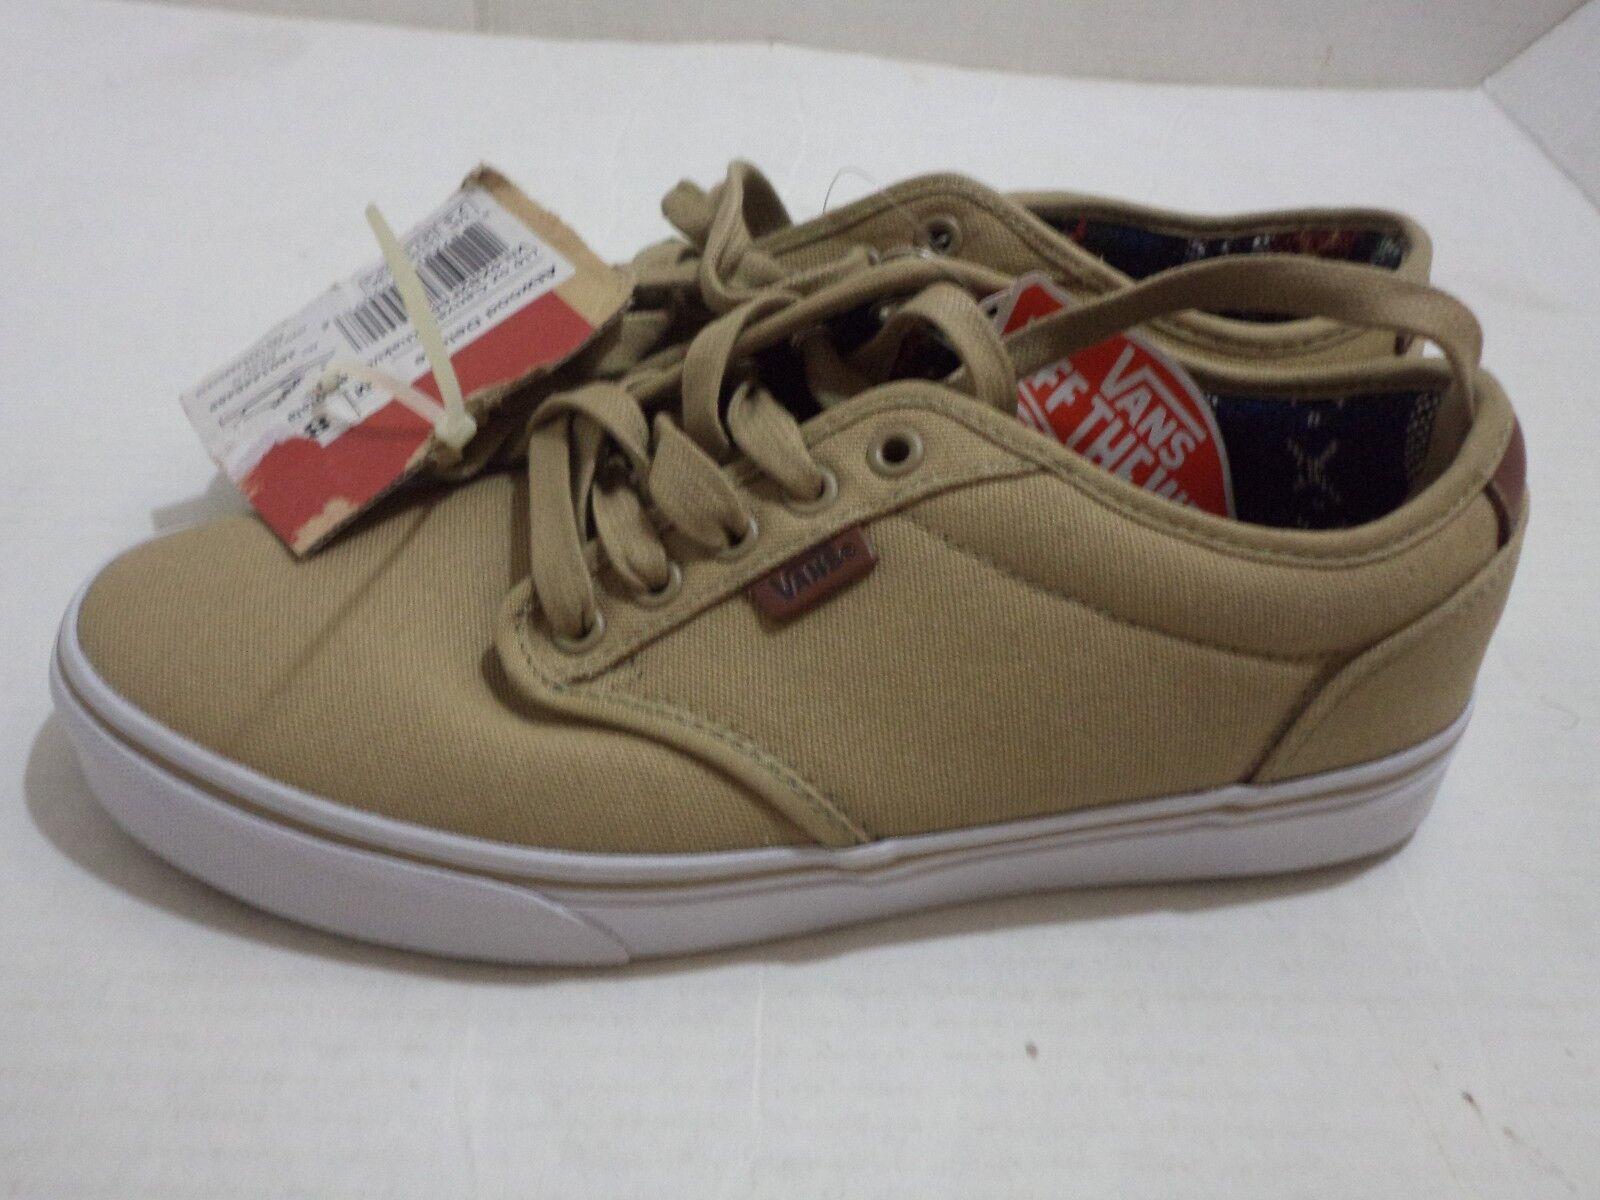 Vans Men's Atwood Skate 13 Shoe Size 8.5 - 13 Skate Color Black, Khaki, Chili, Navy Blue 285c4a